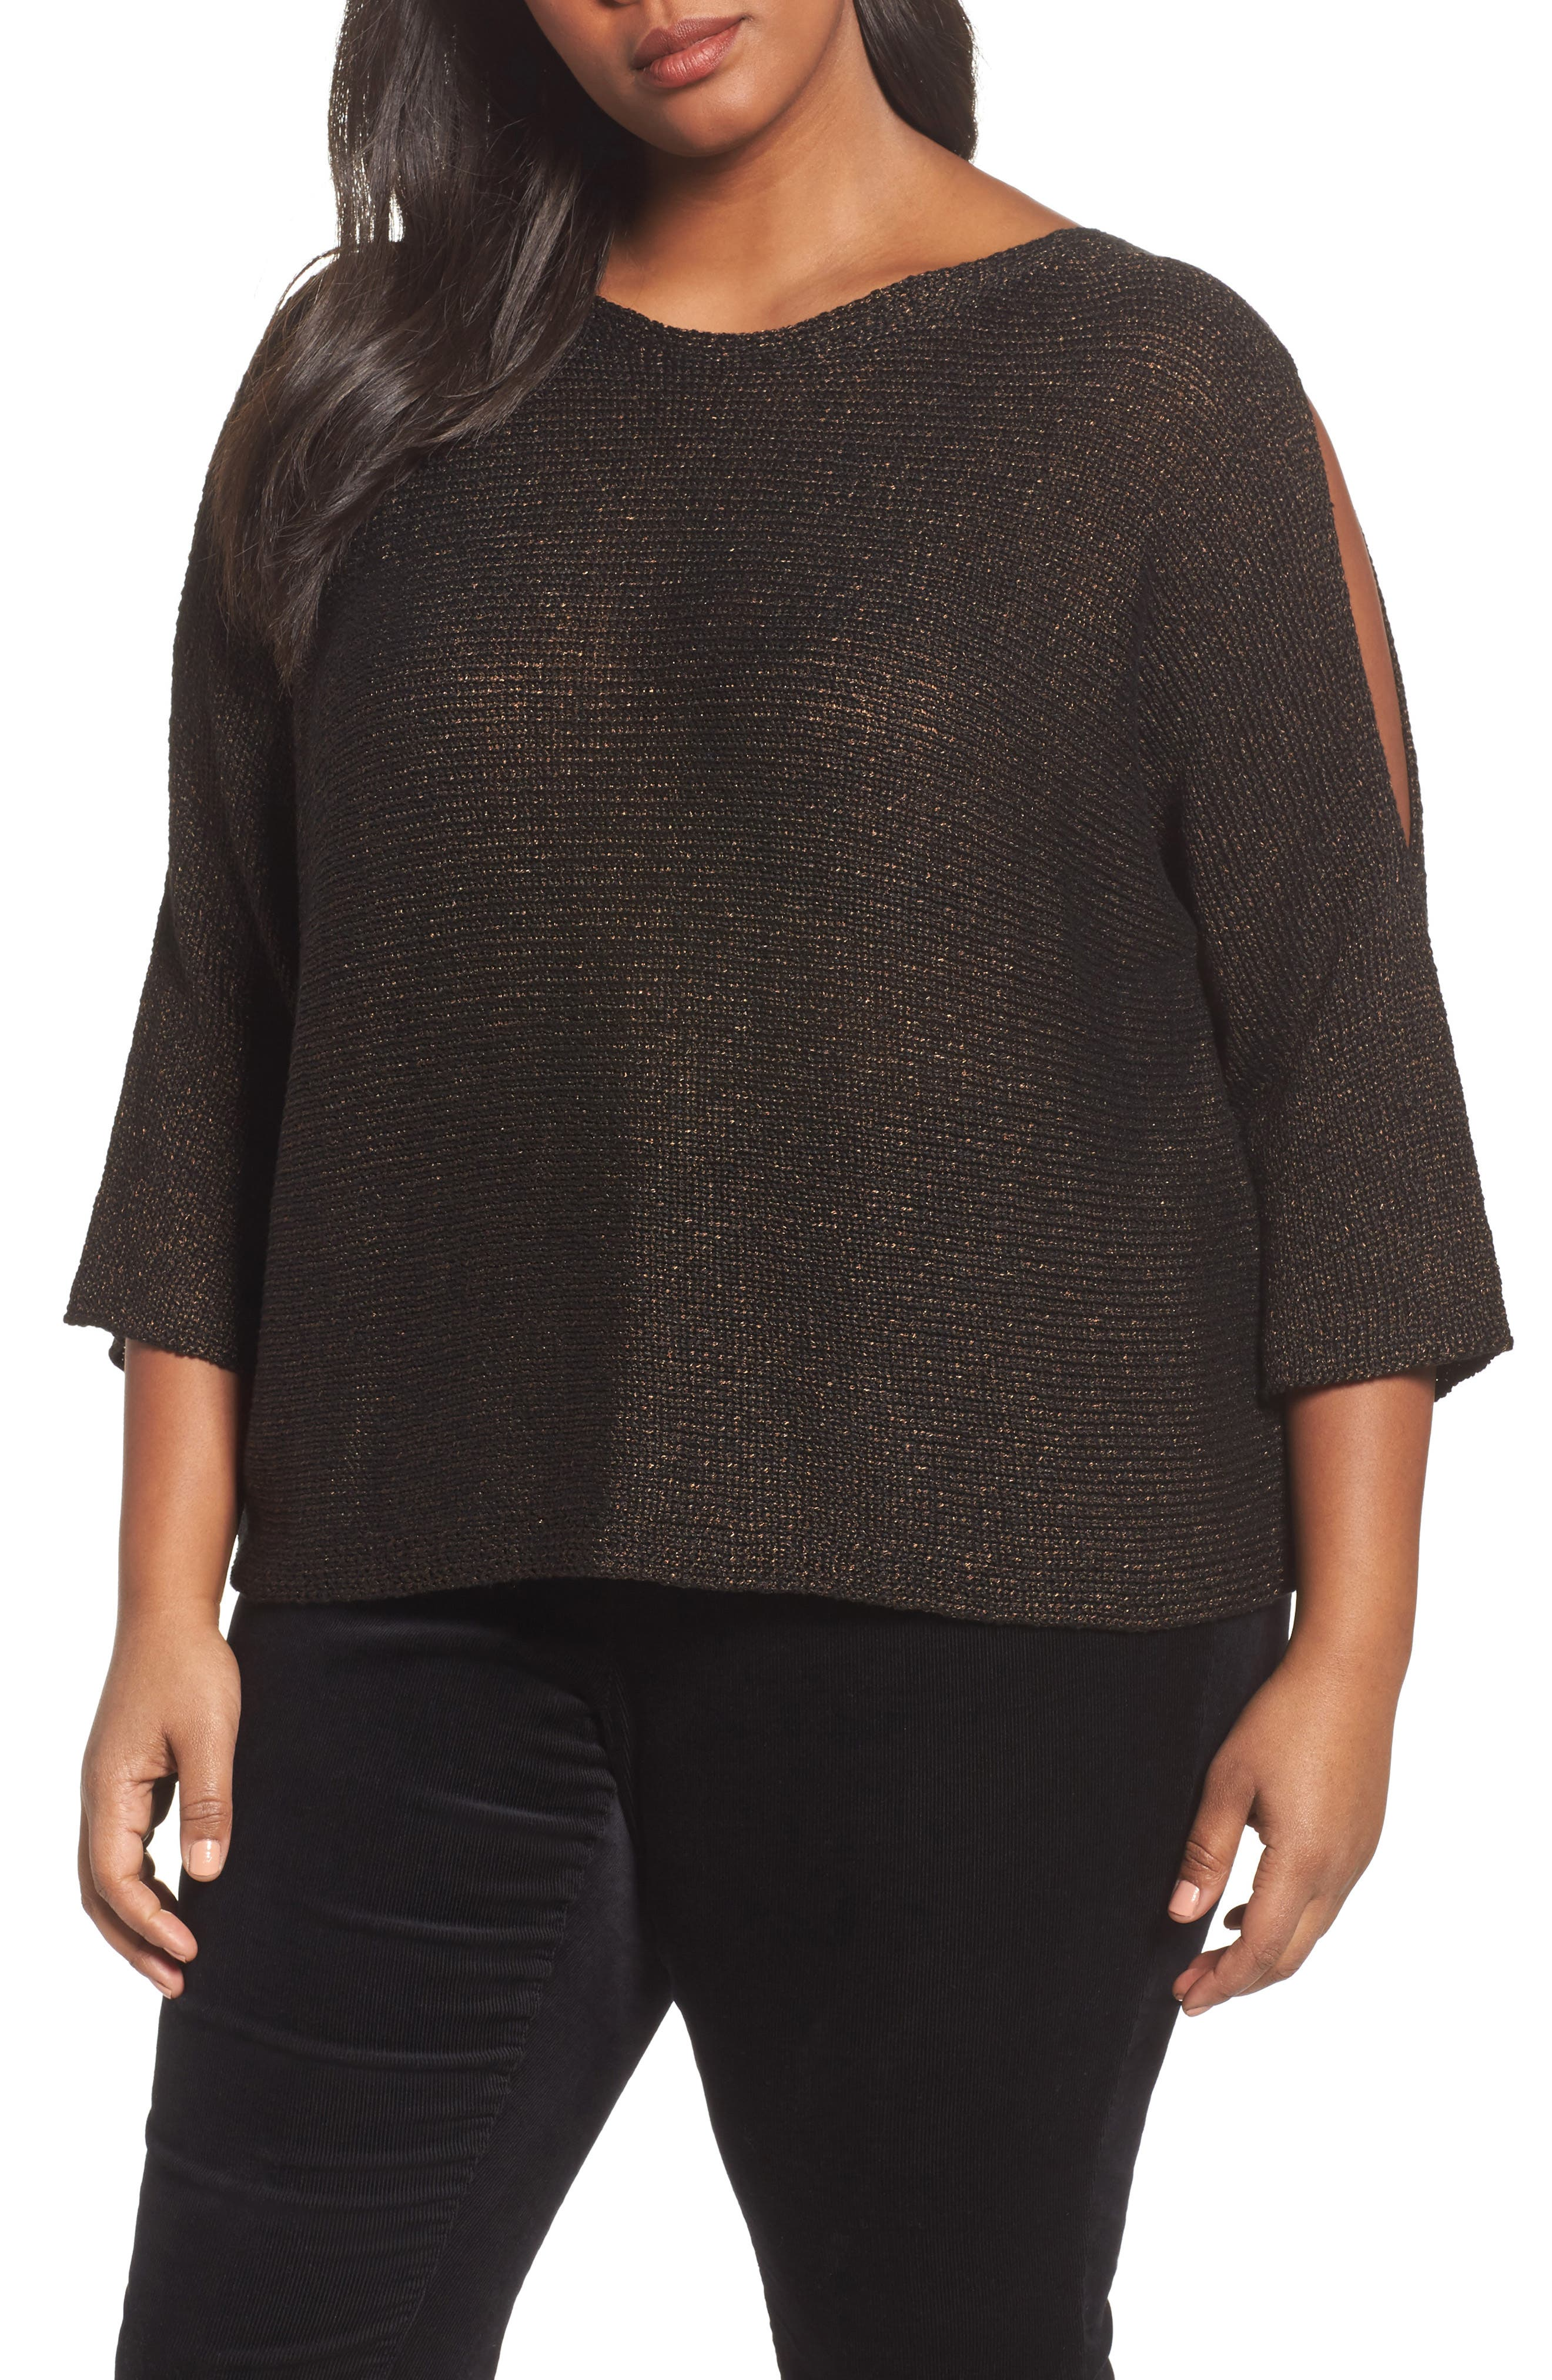 Alternate Image 1 Selected - Eileen Fisher Metallic Organic Linen Blend Sweater (Plus Size)